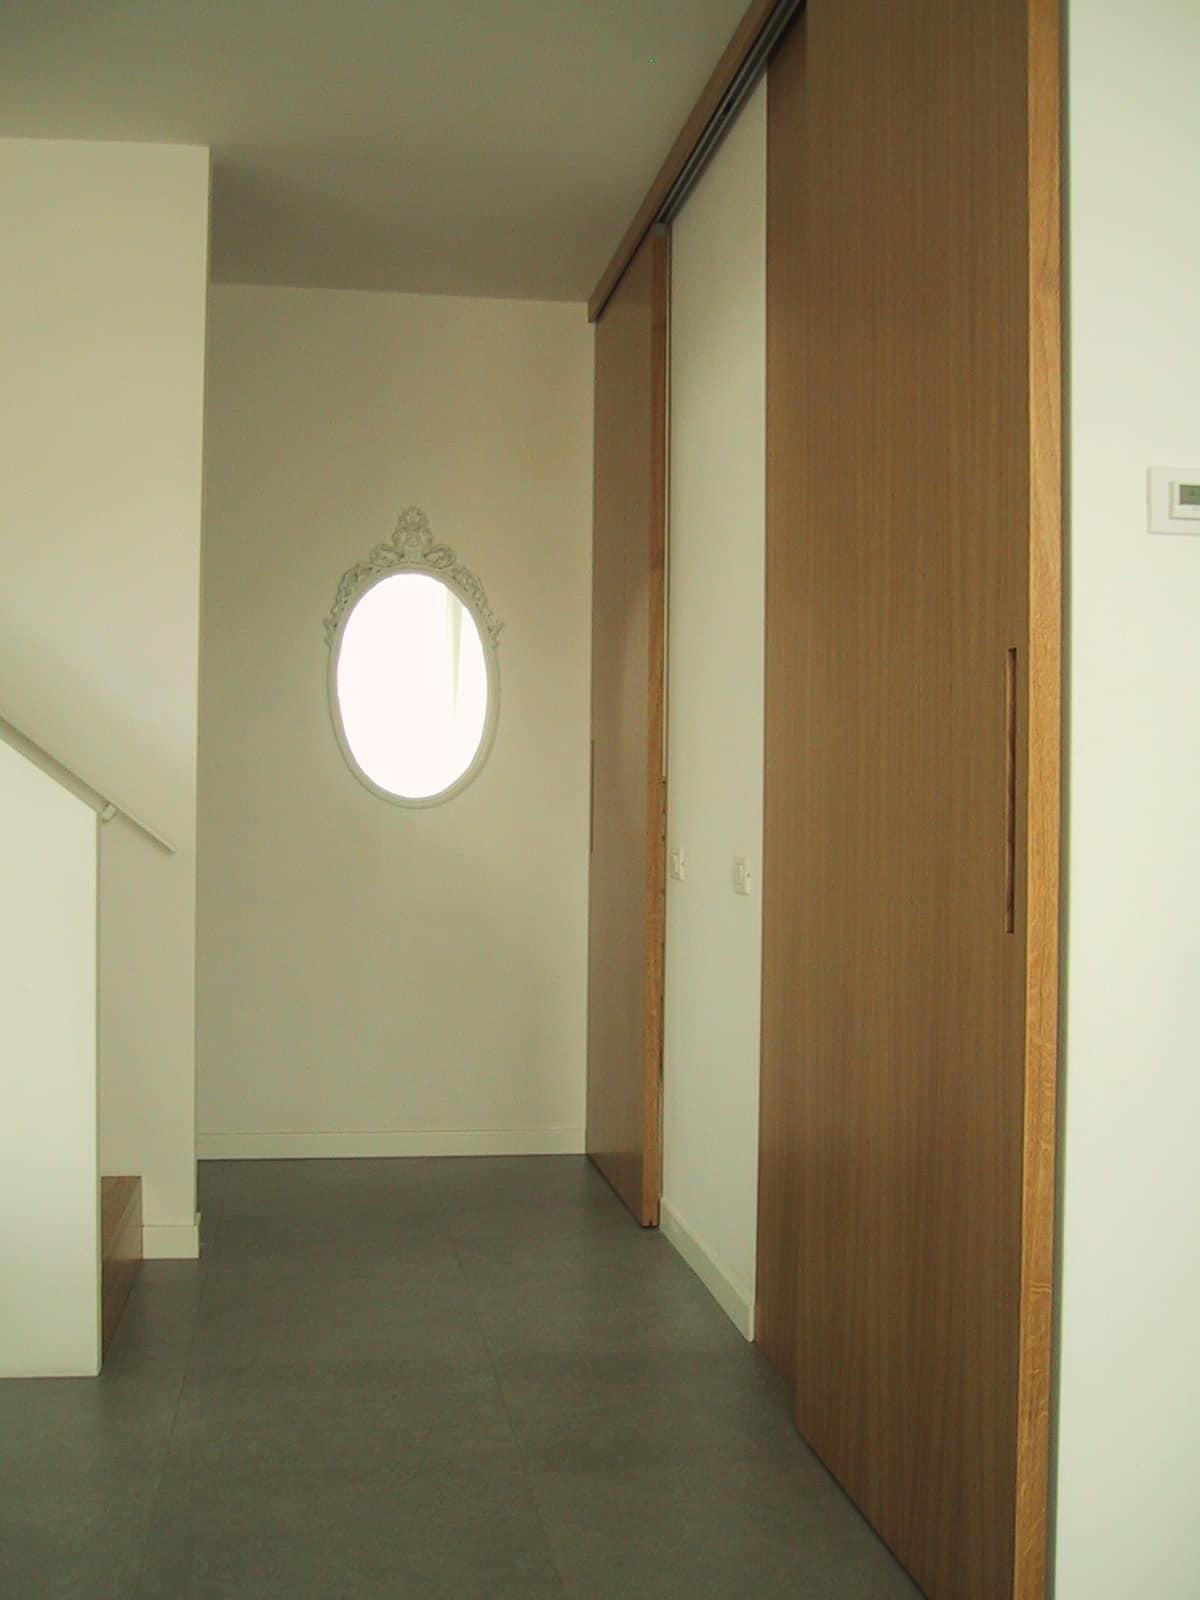 Armadio su misura per corridoio ed camera | IDFdesign